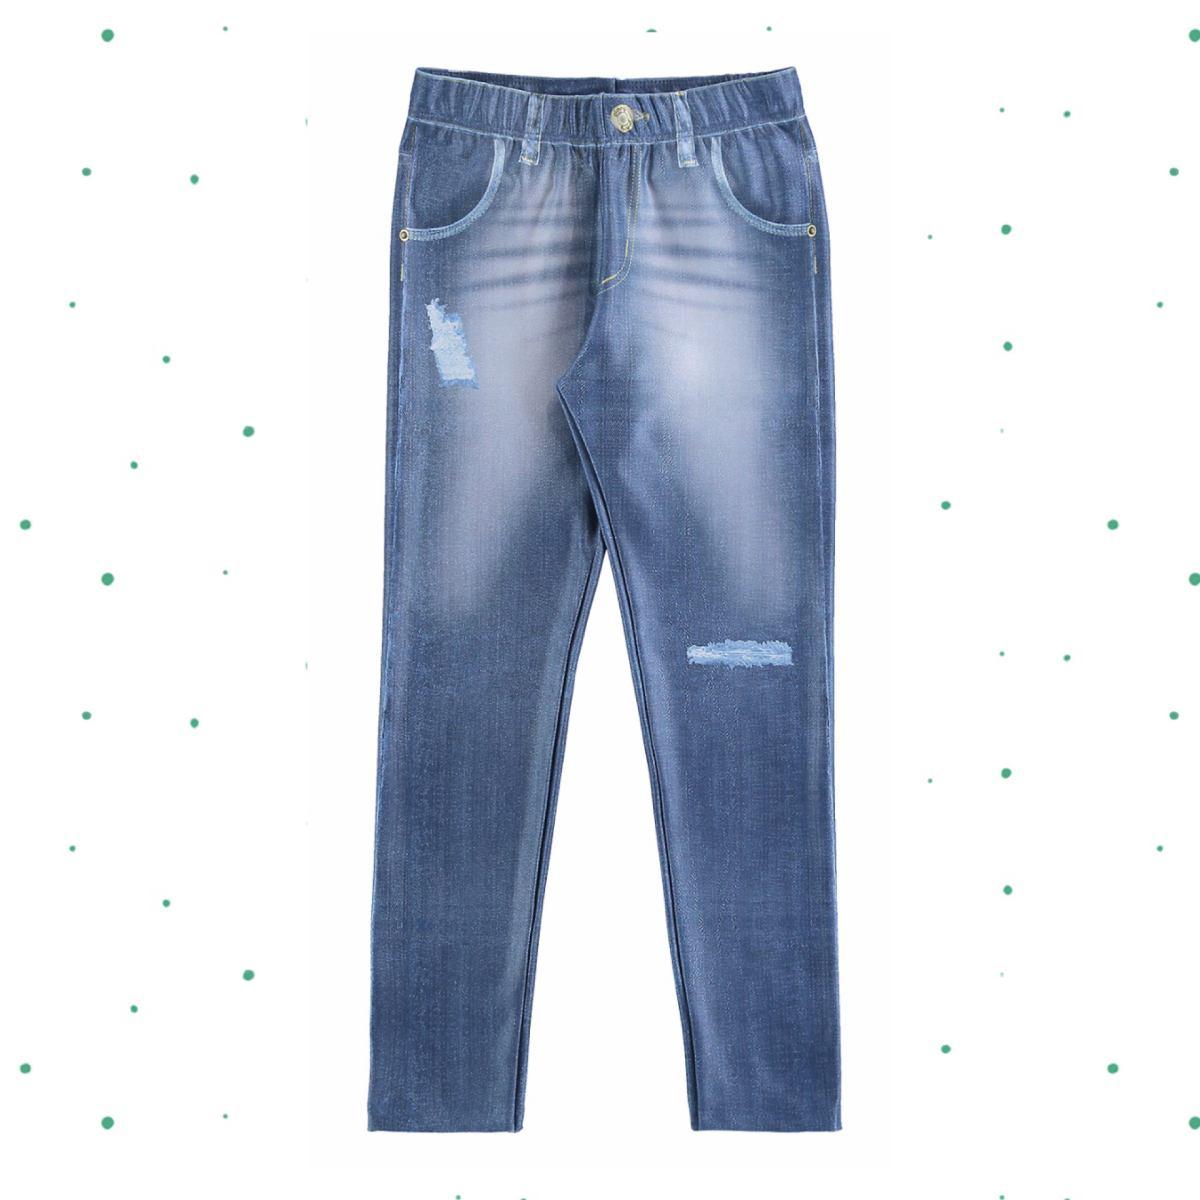 Legging Menina Glinny em Malha Térmica Imita Jeans